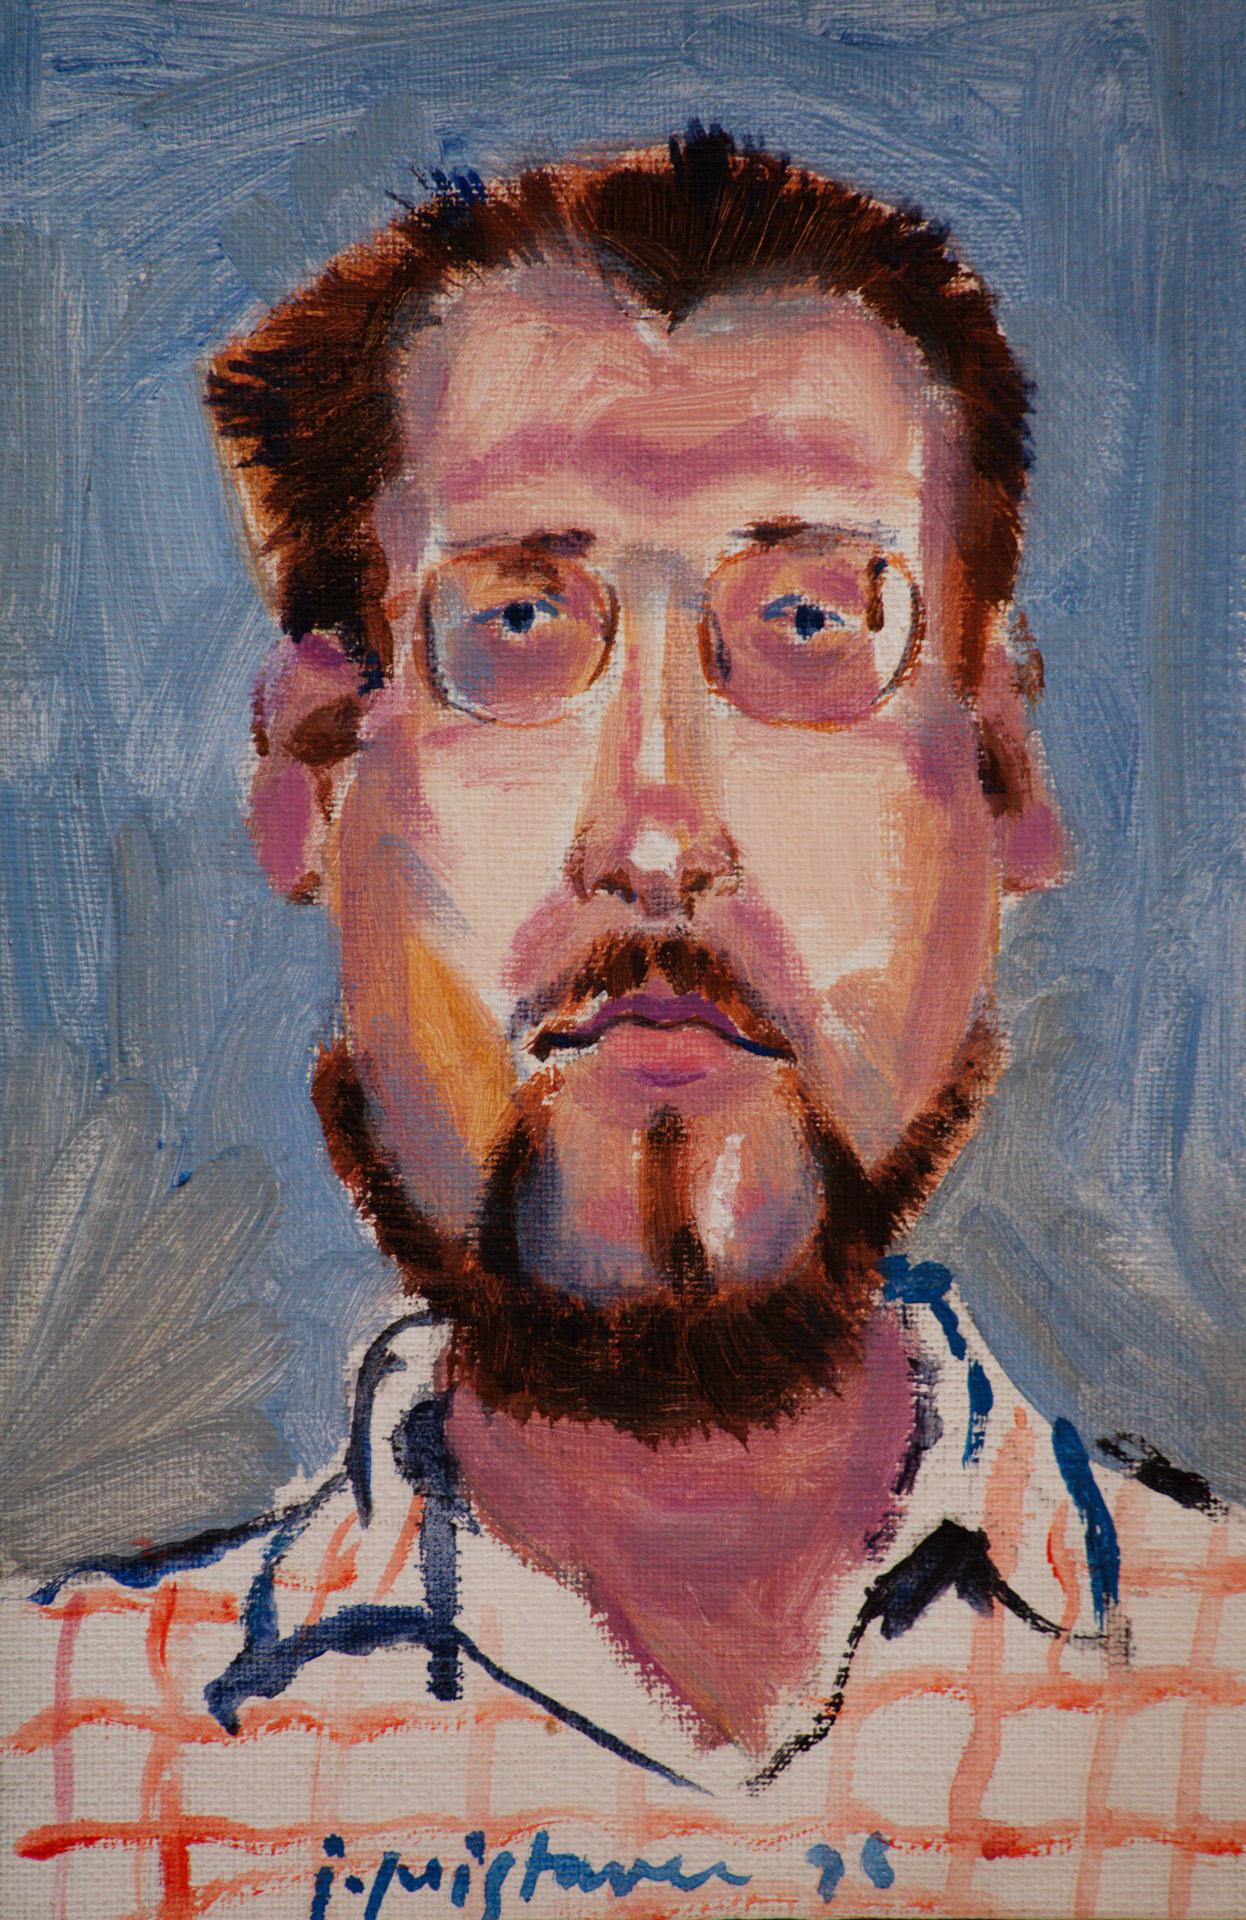 1996_portrait_20x30cm_Kramberger_Igor.jpg